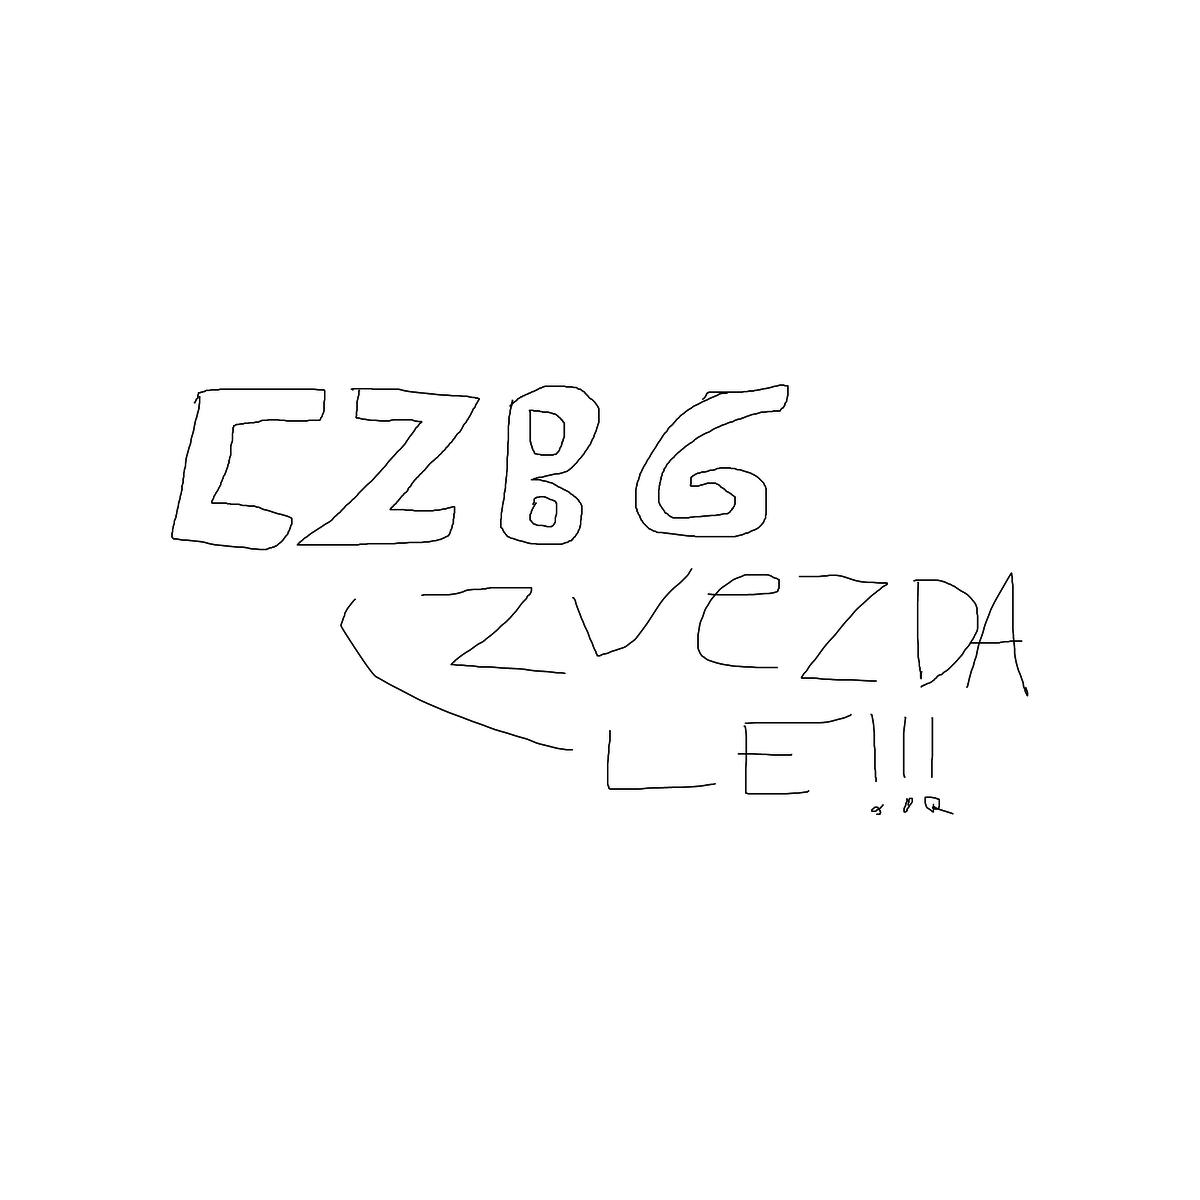 BAAAM drawing#8244 lat:44.7865867614746100lng: 20.4489994049072270